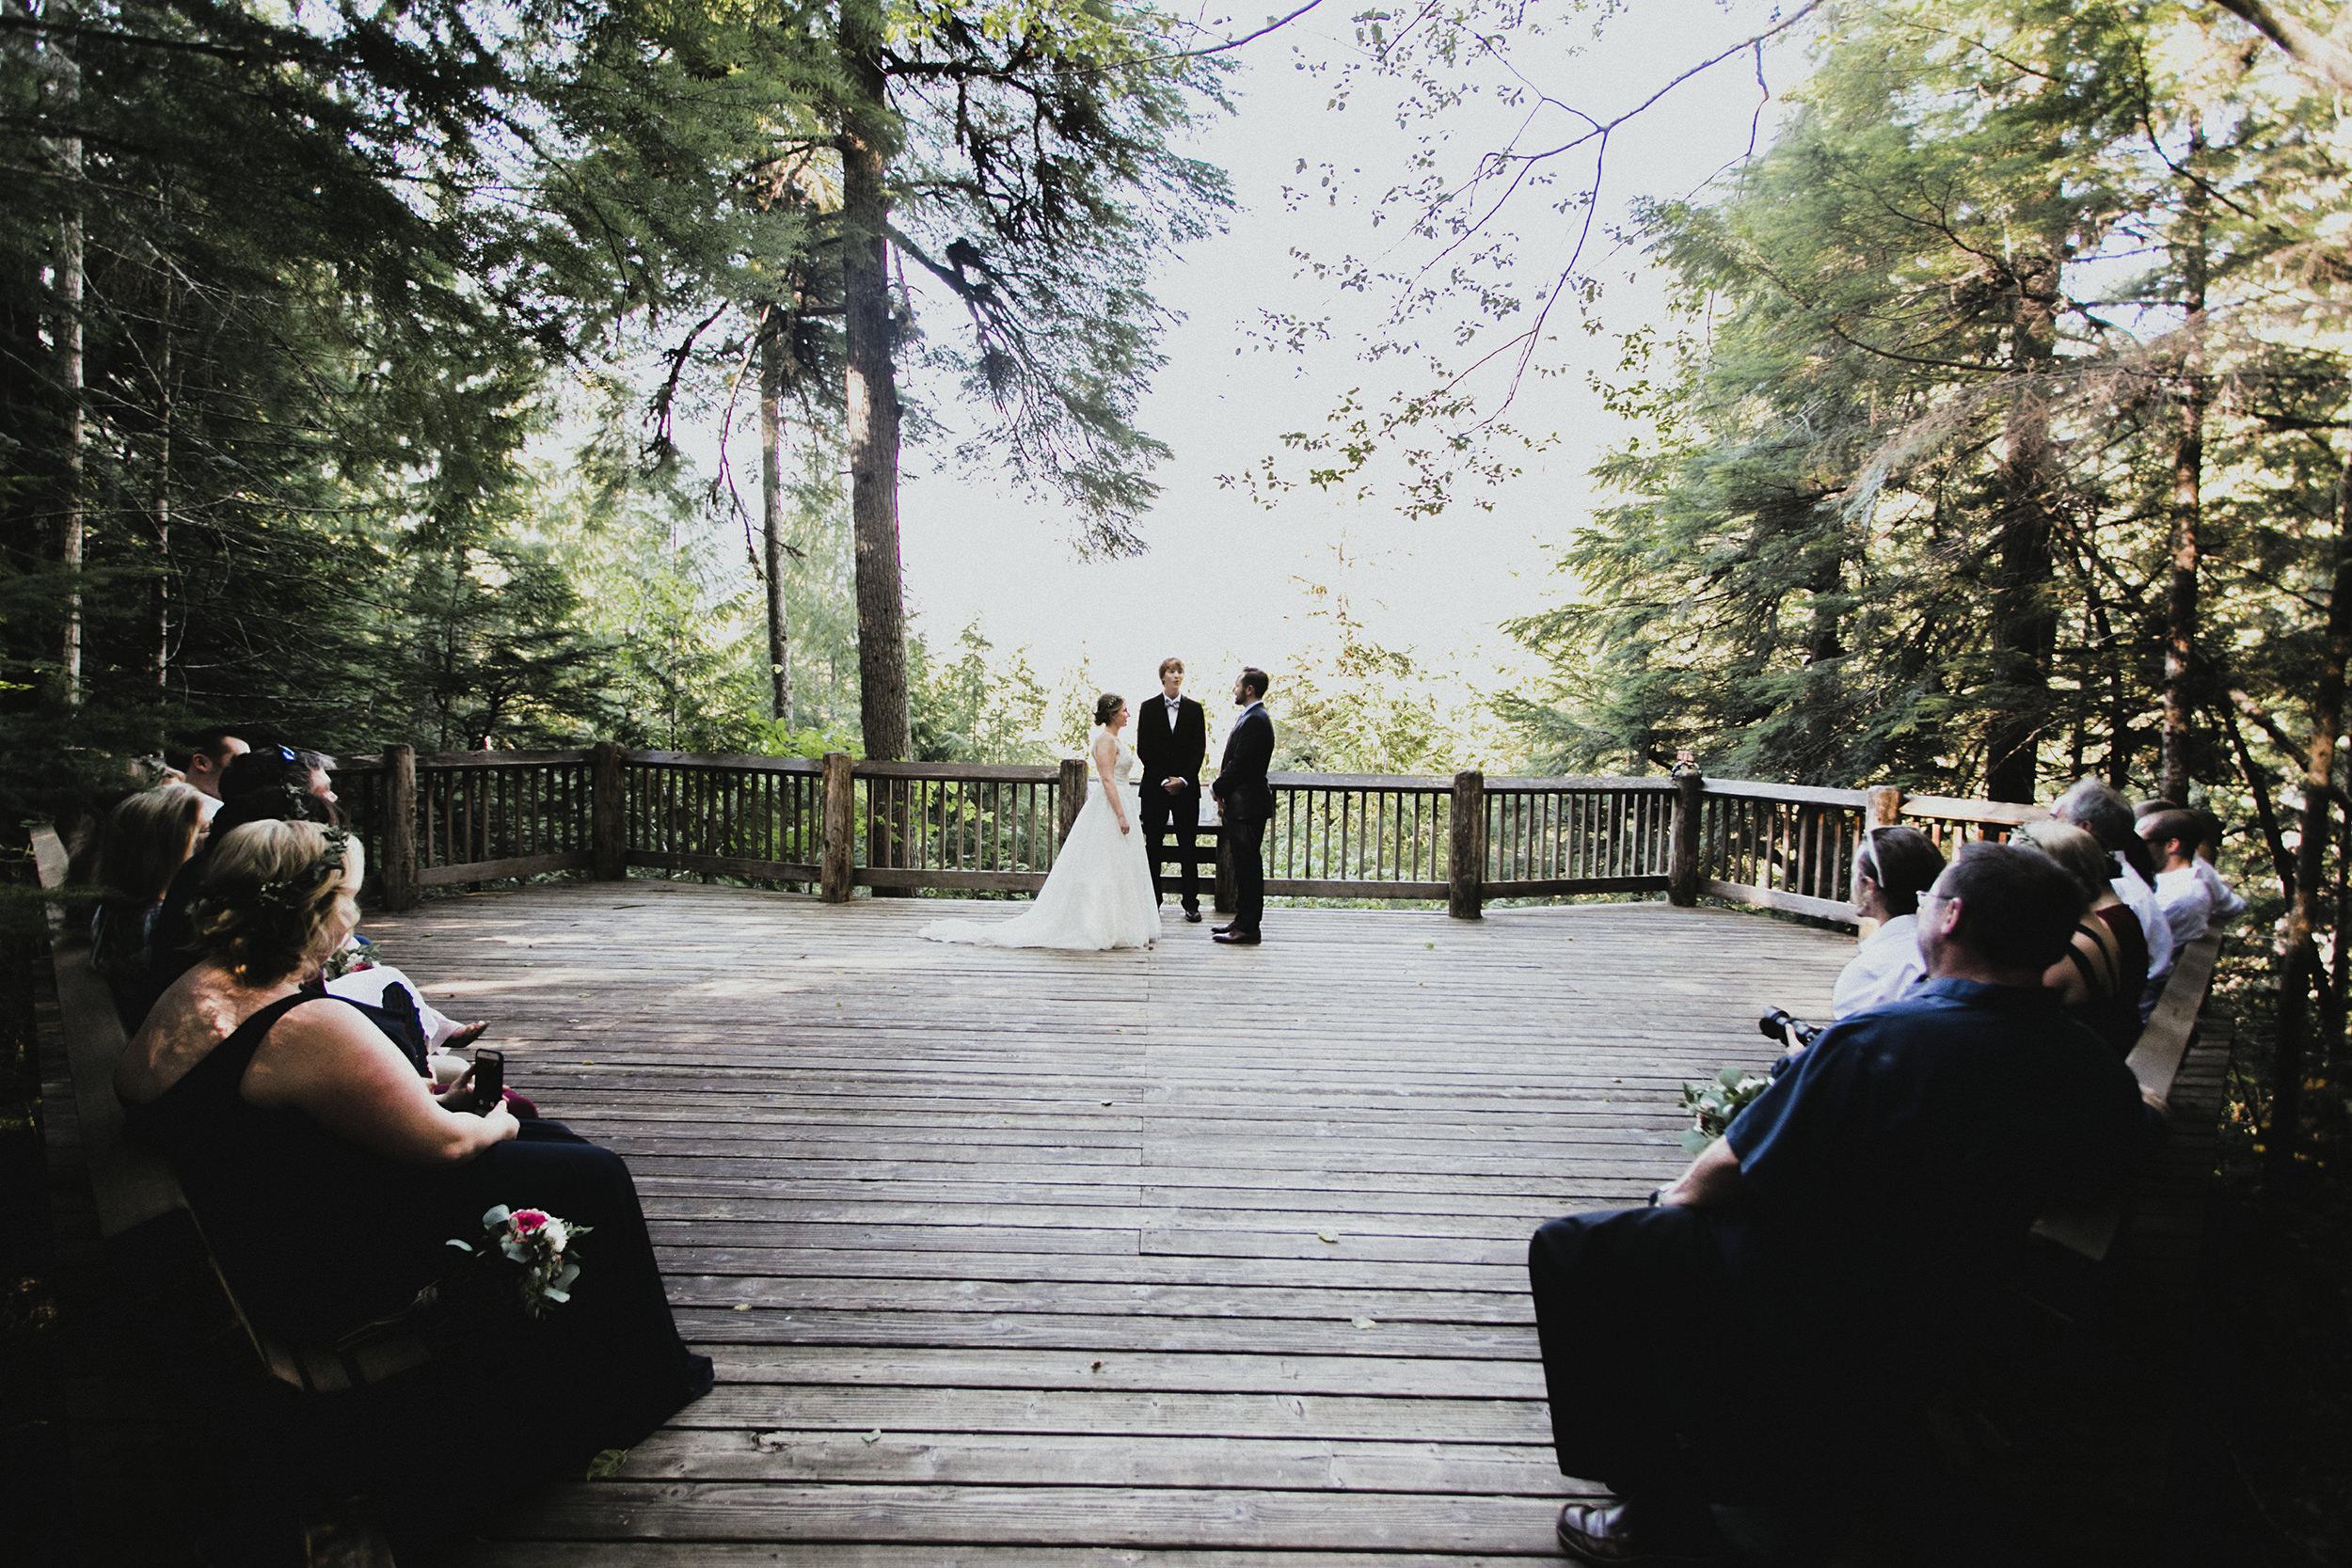 north cascades visitor center wedding ceremony